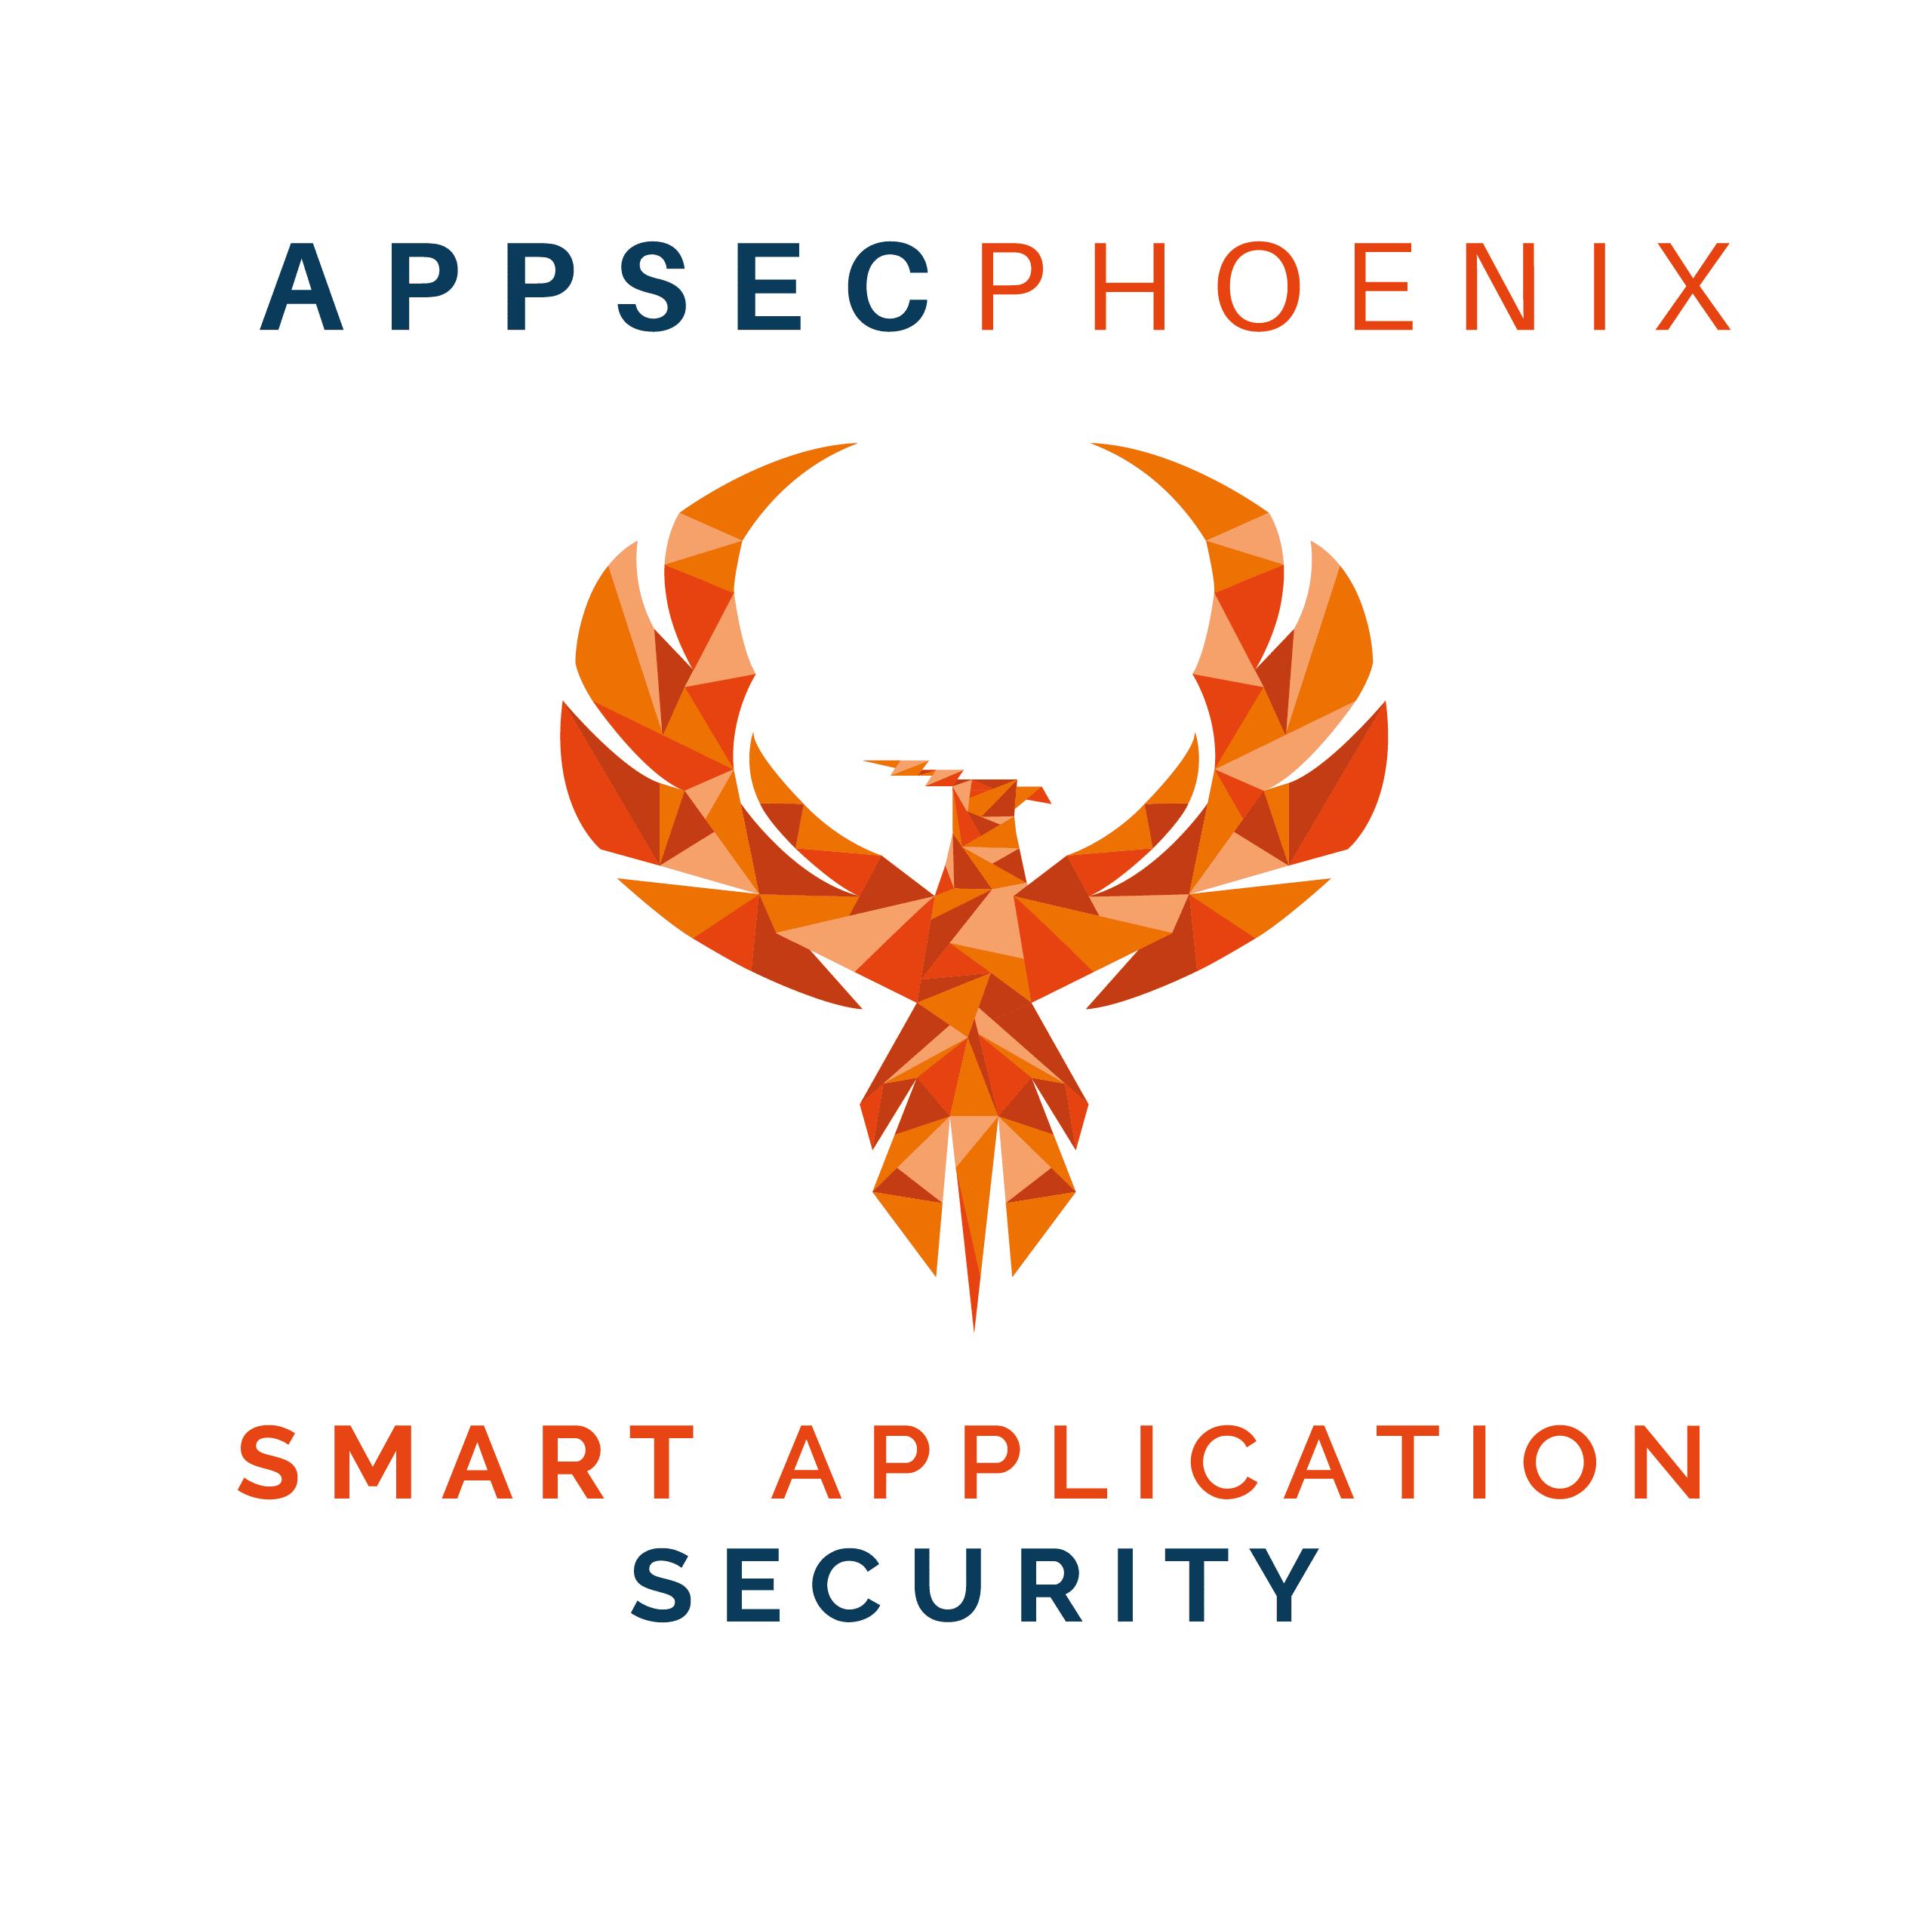 AppSec Phoenix Launch the New 2.0 Version of the AppSec Phoenix Platform